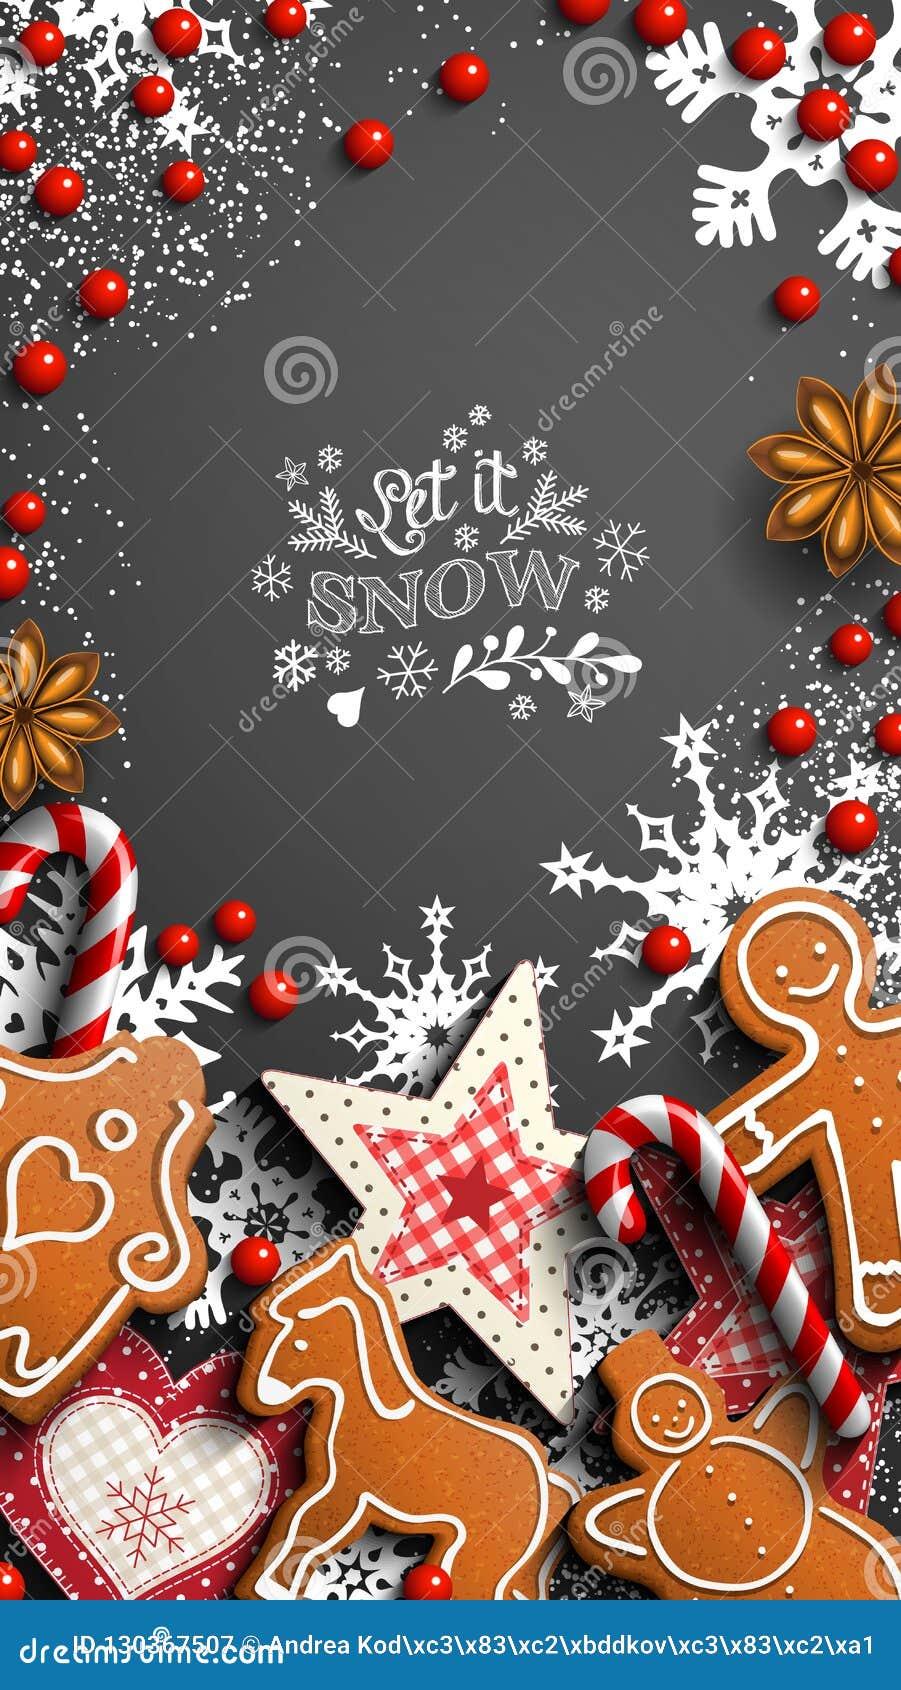 Mobile Phone Christmas Wallpaper ...